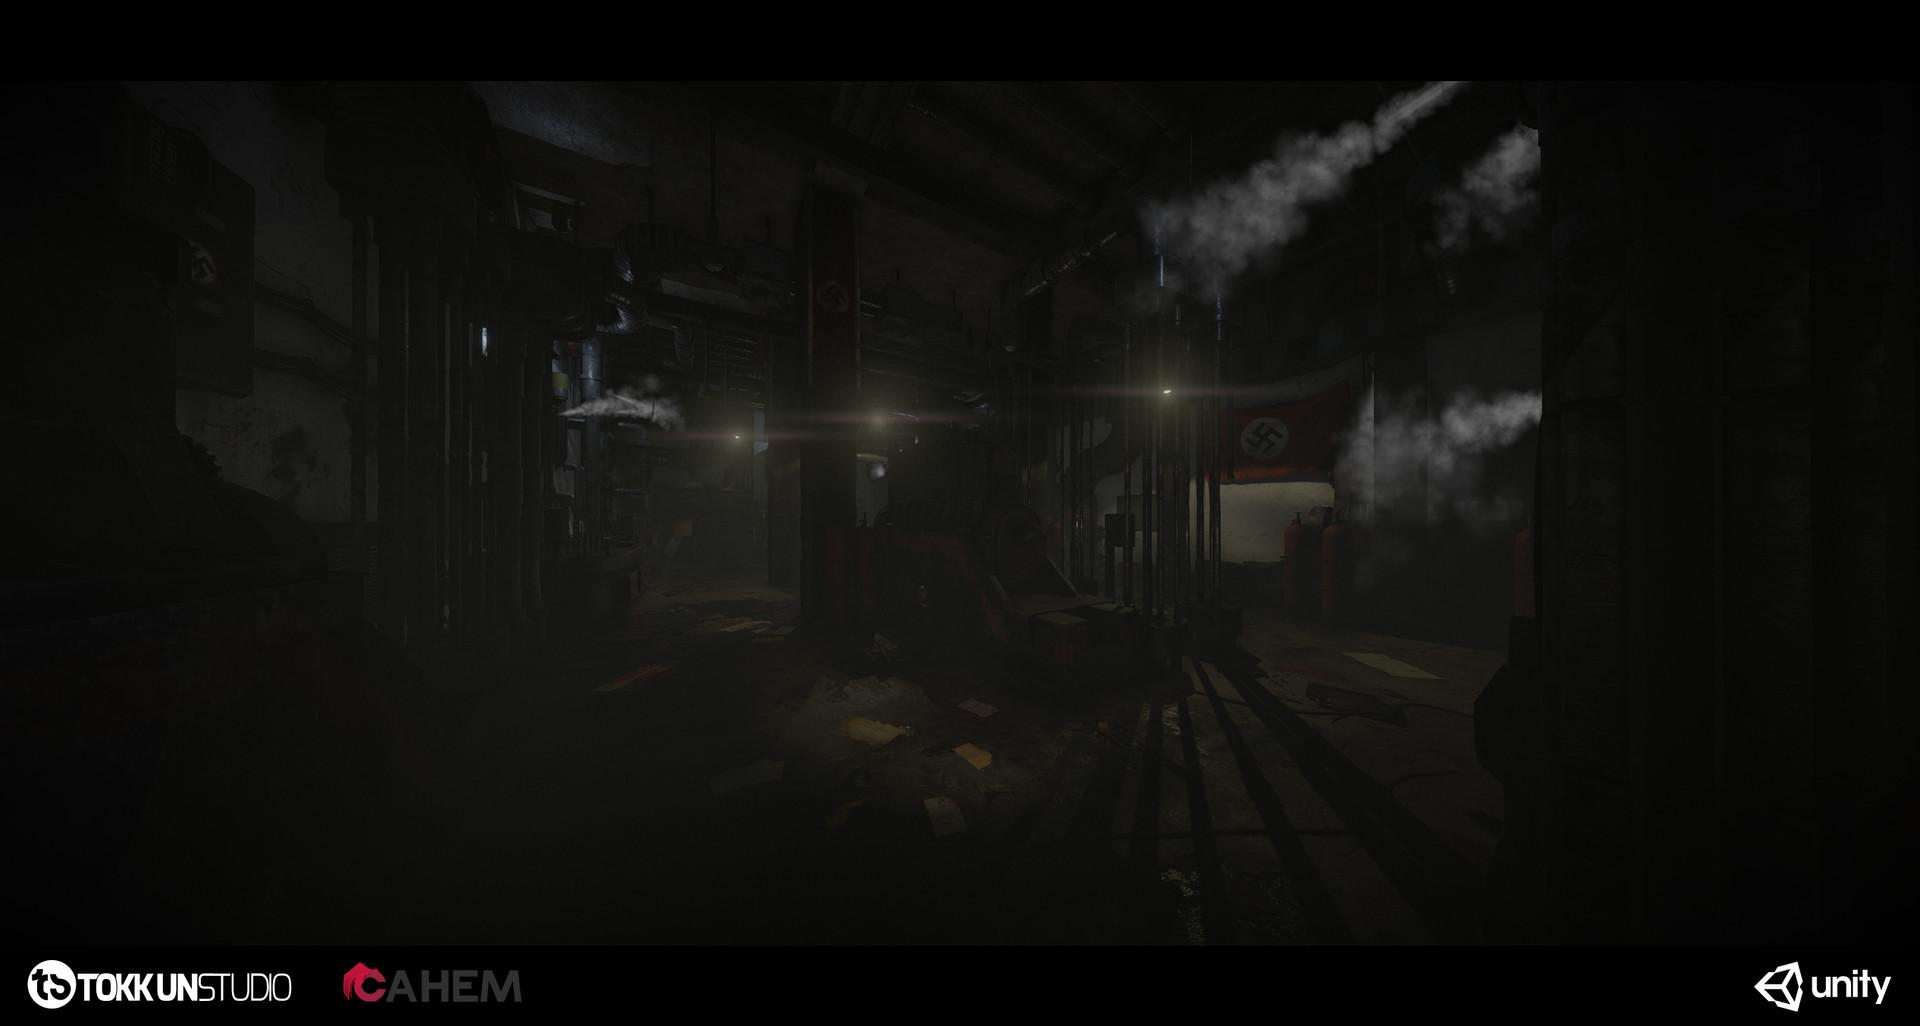 Tokkun studio bunker shot 20